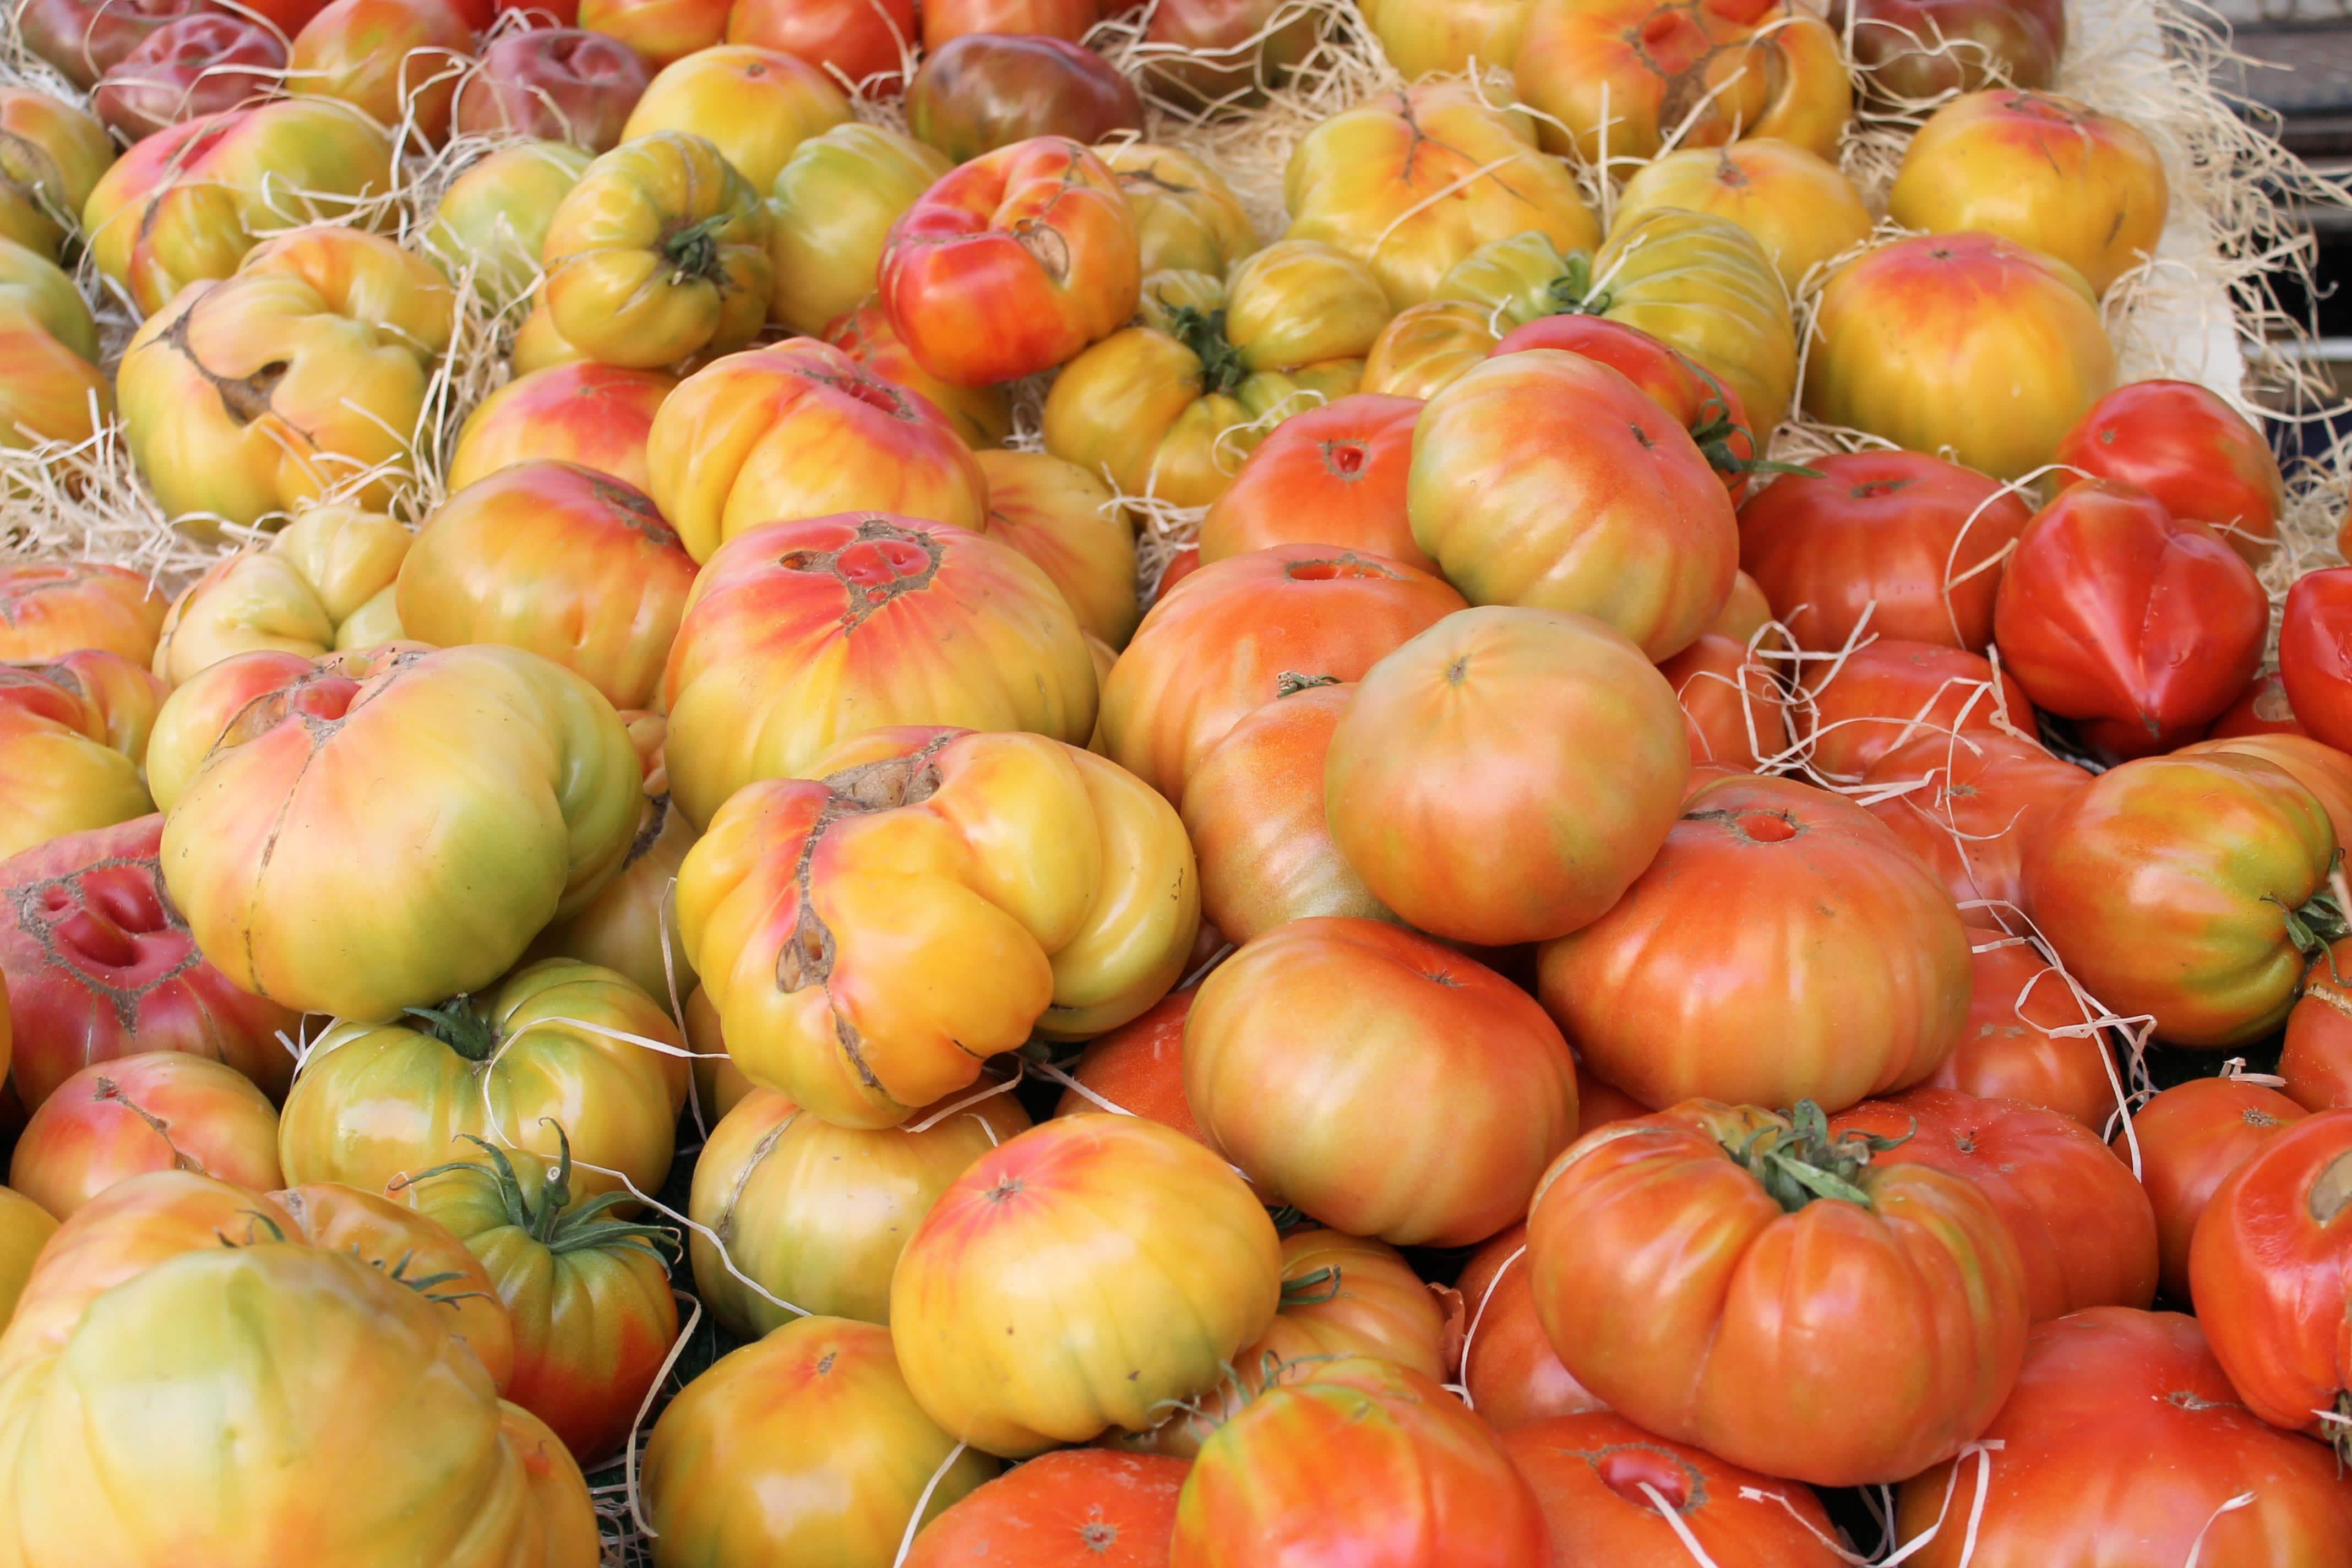 Shore excursion, beefheart tomato stall, Aix en Provence